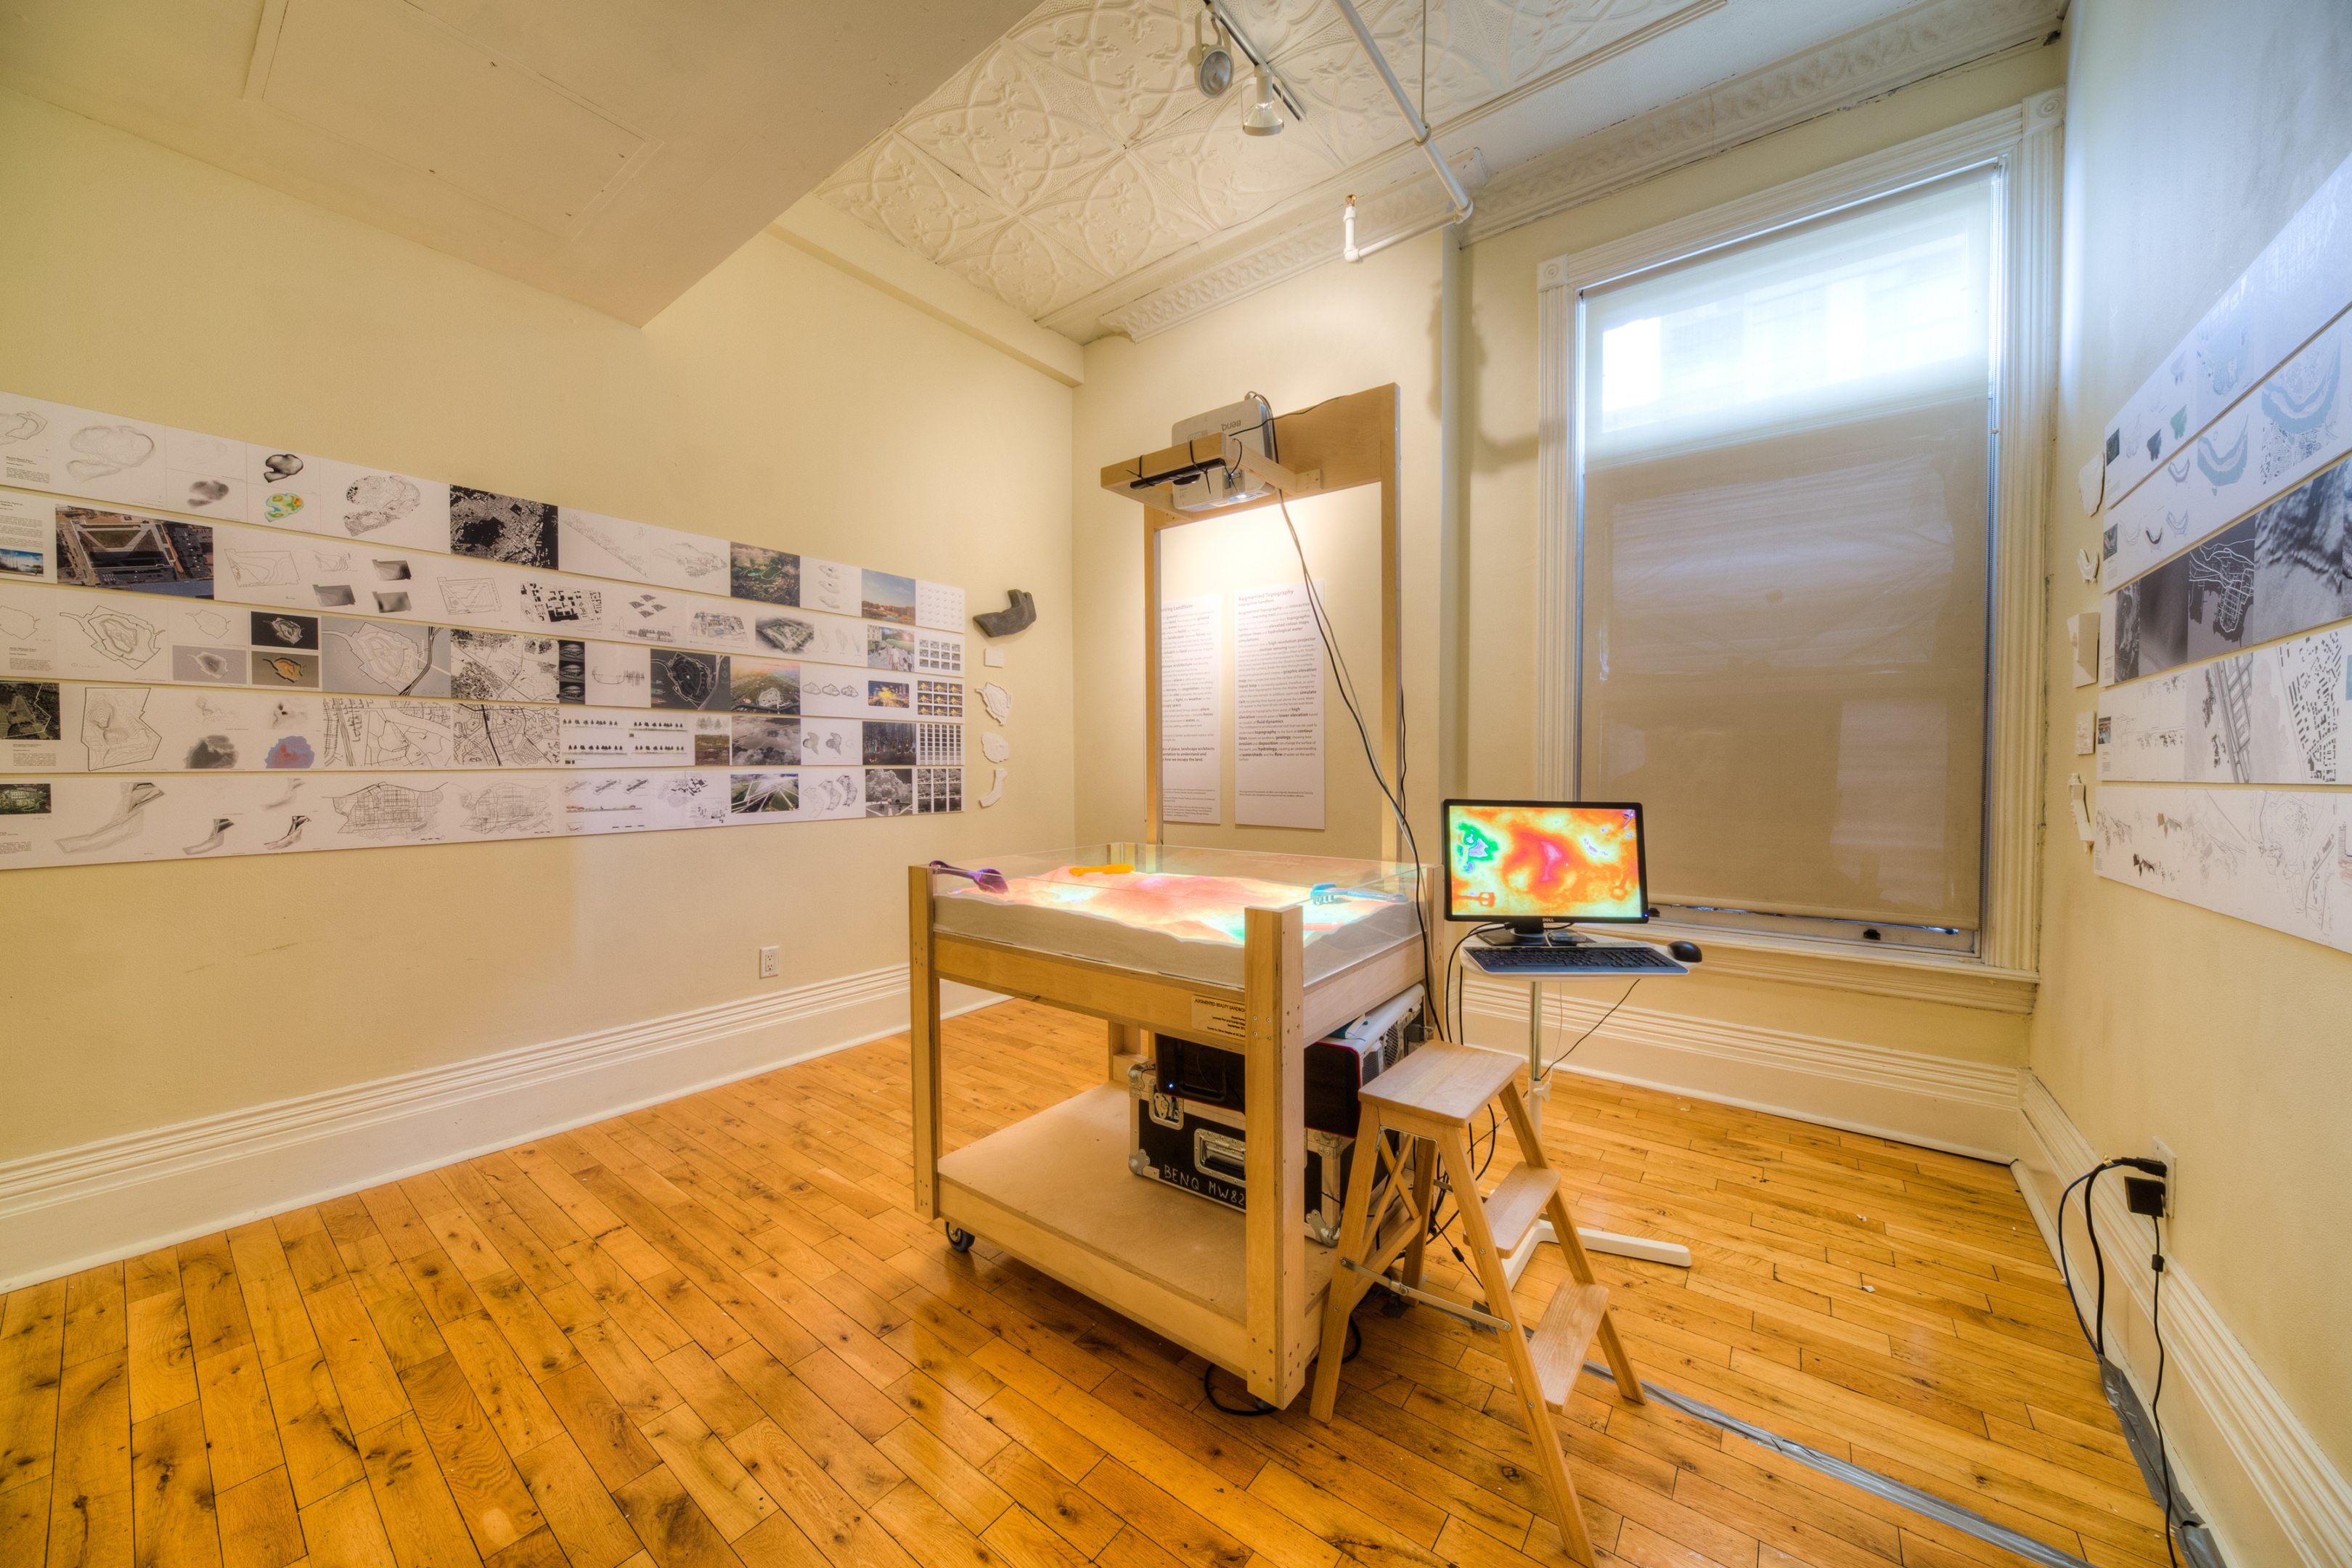 toronto-art-the-gladstone-hotel-grow-op-2017-augmented-topography-shadi-ramos